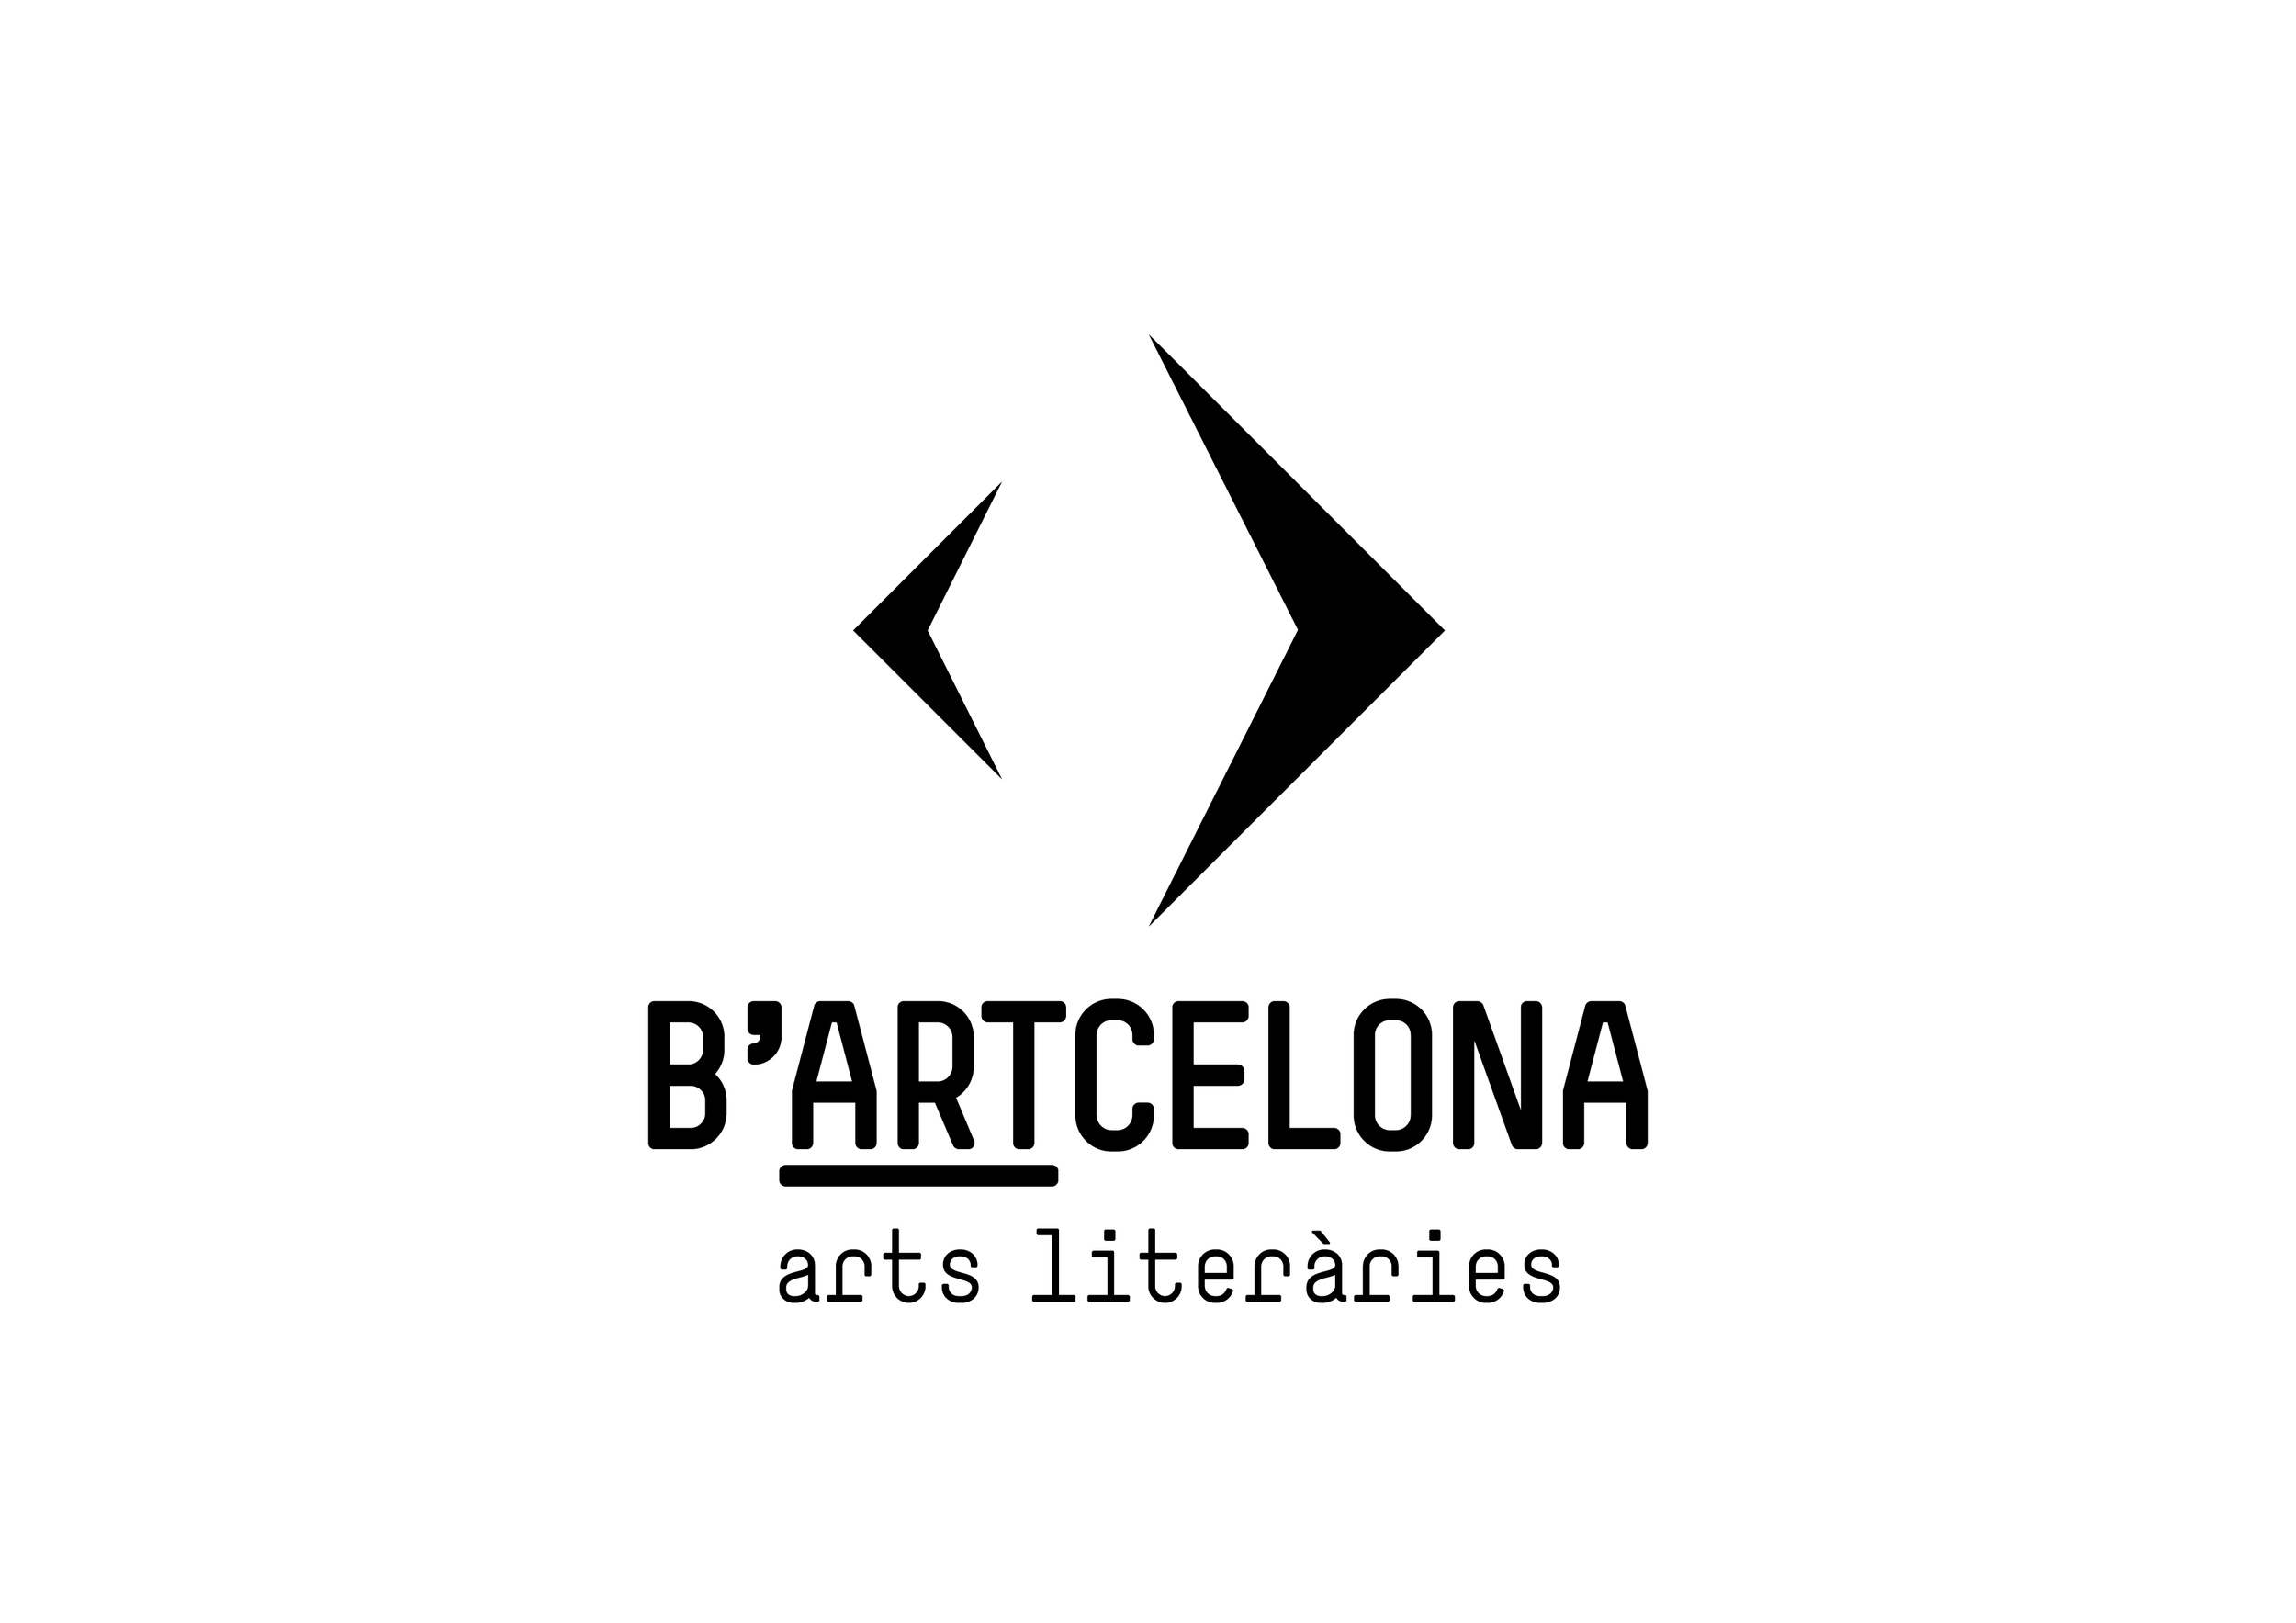 bartcelona_logo_victorgc-03.jpg